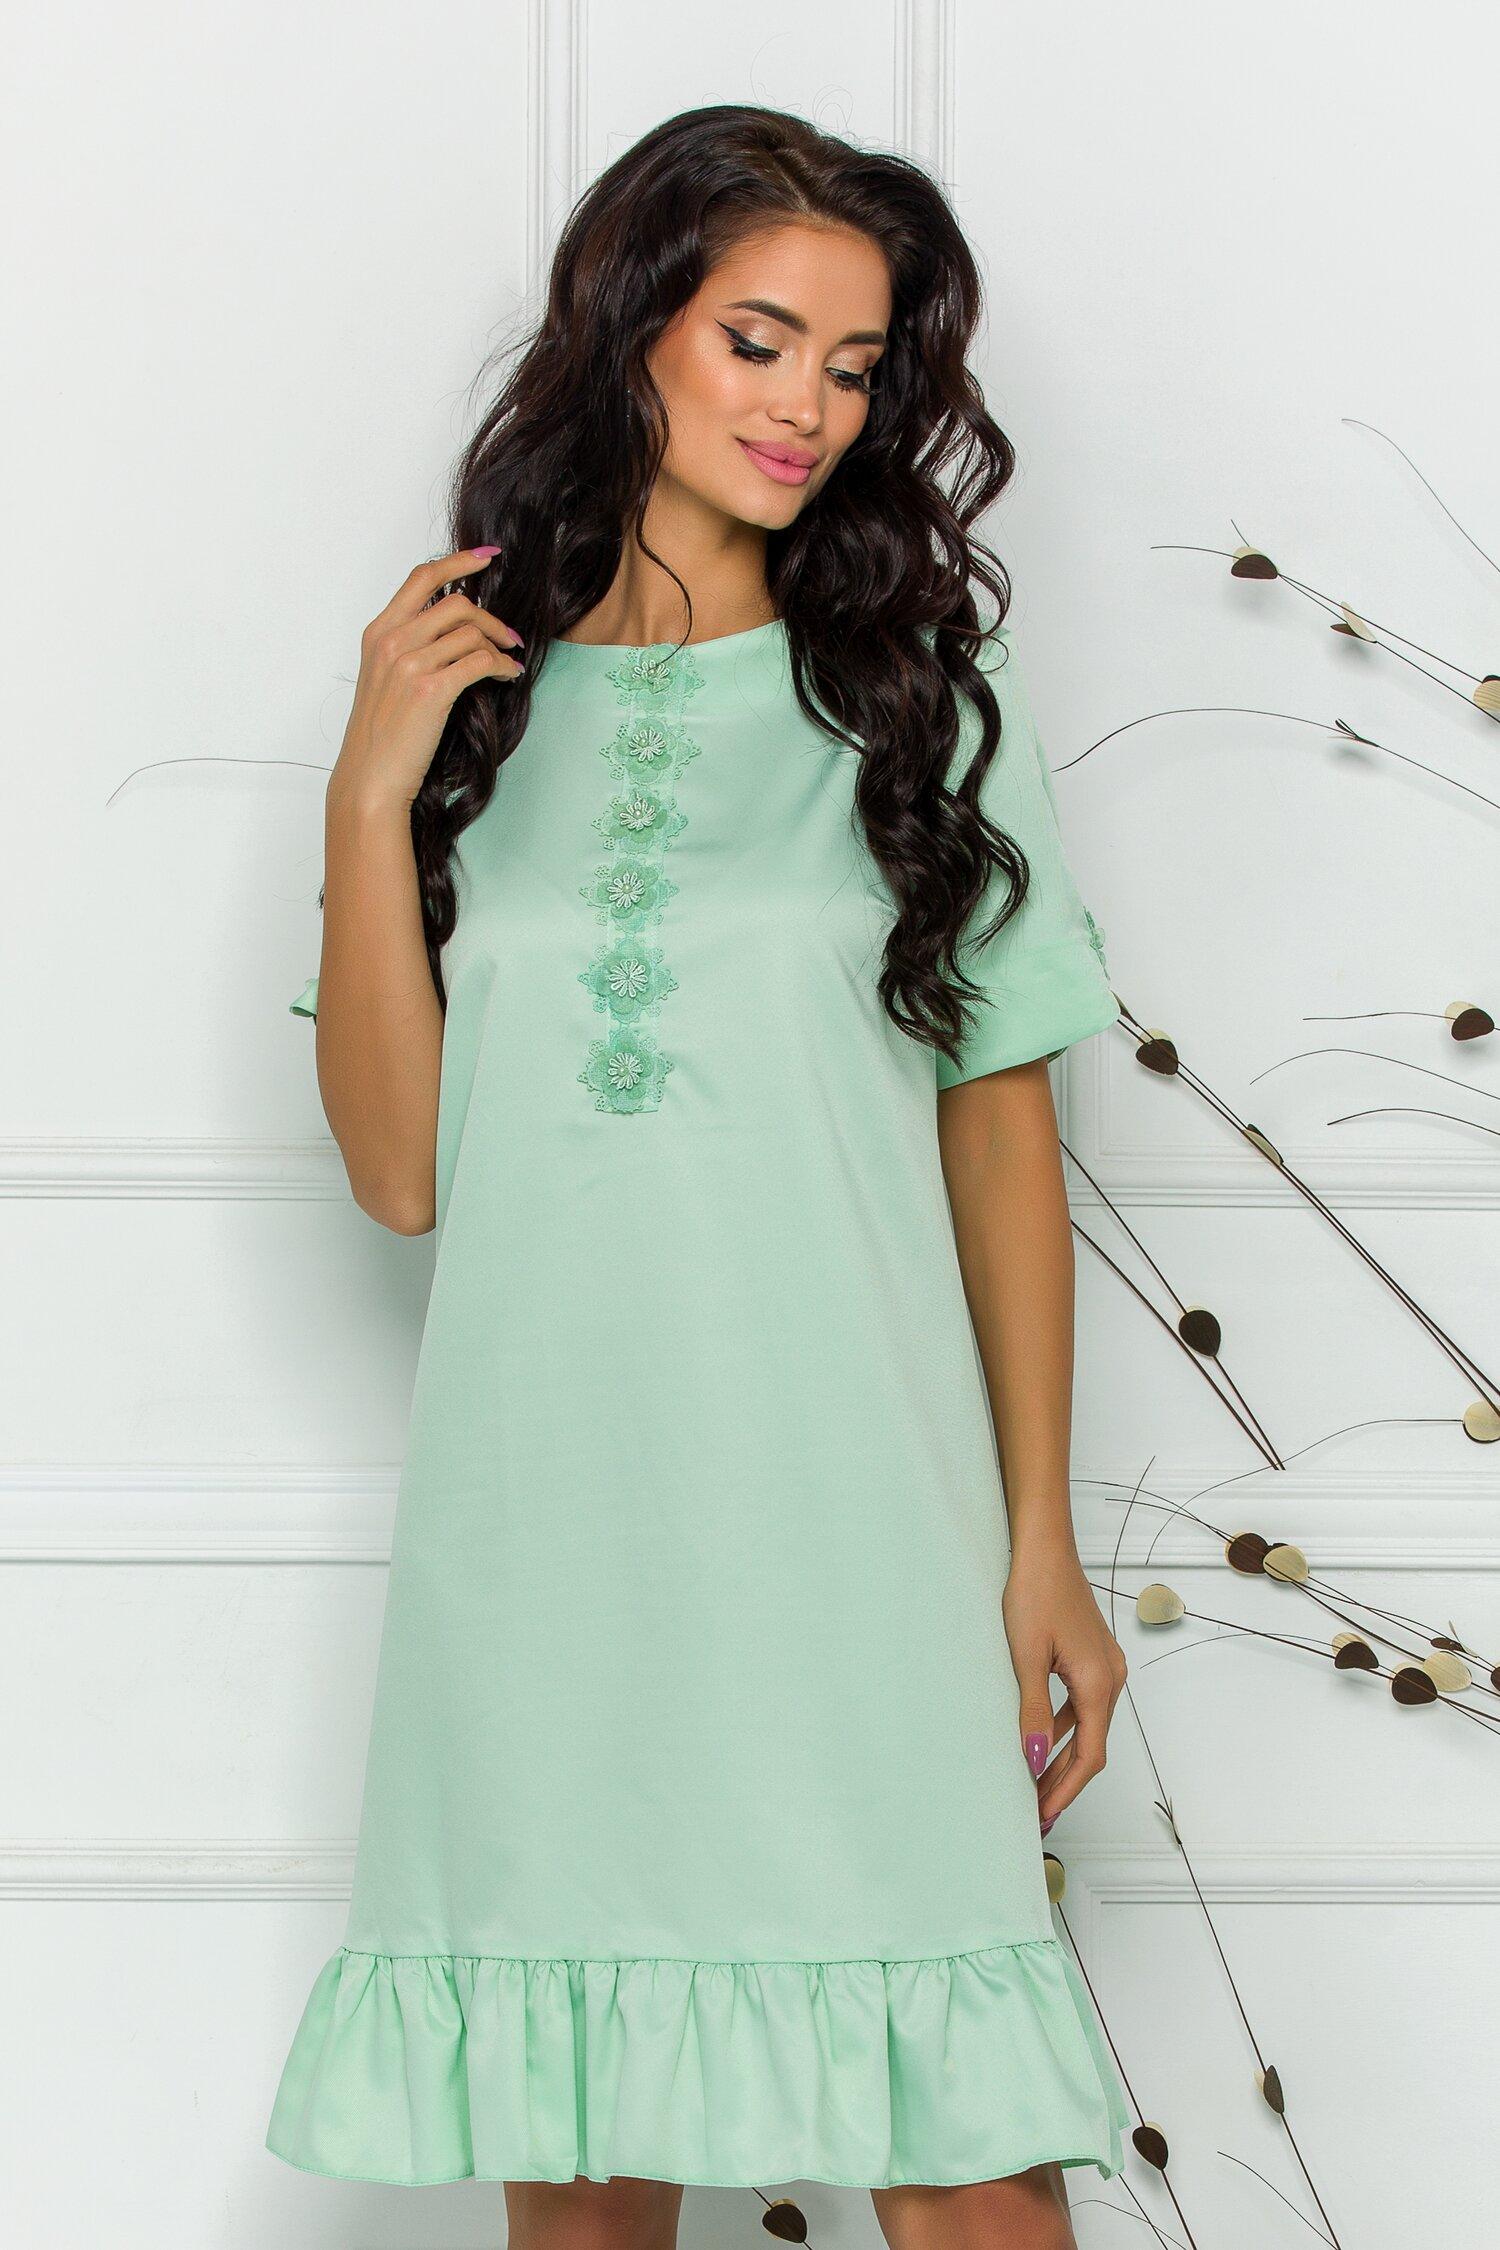 rochie dany verde mint cu broderie delicata la bust 598270 4